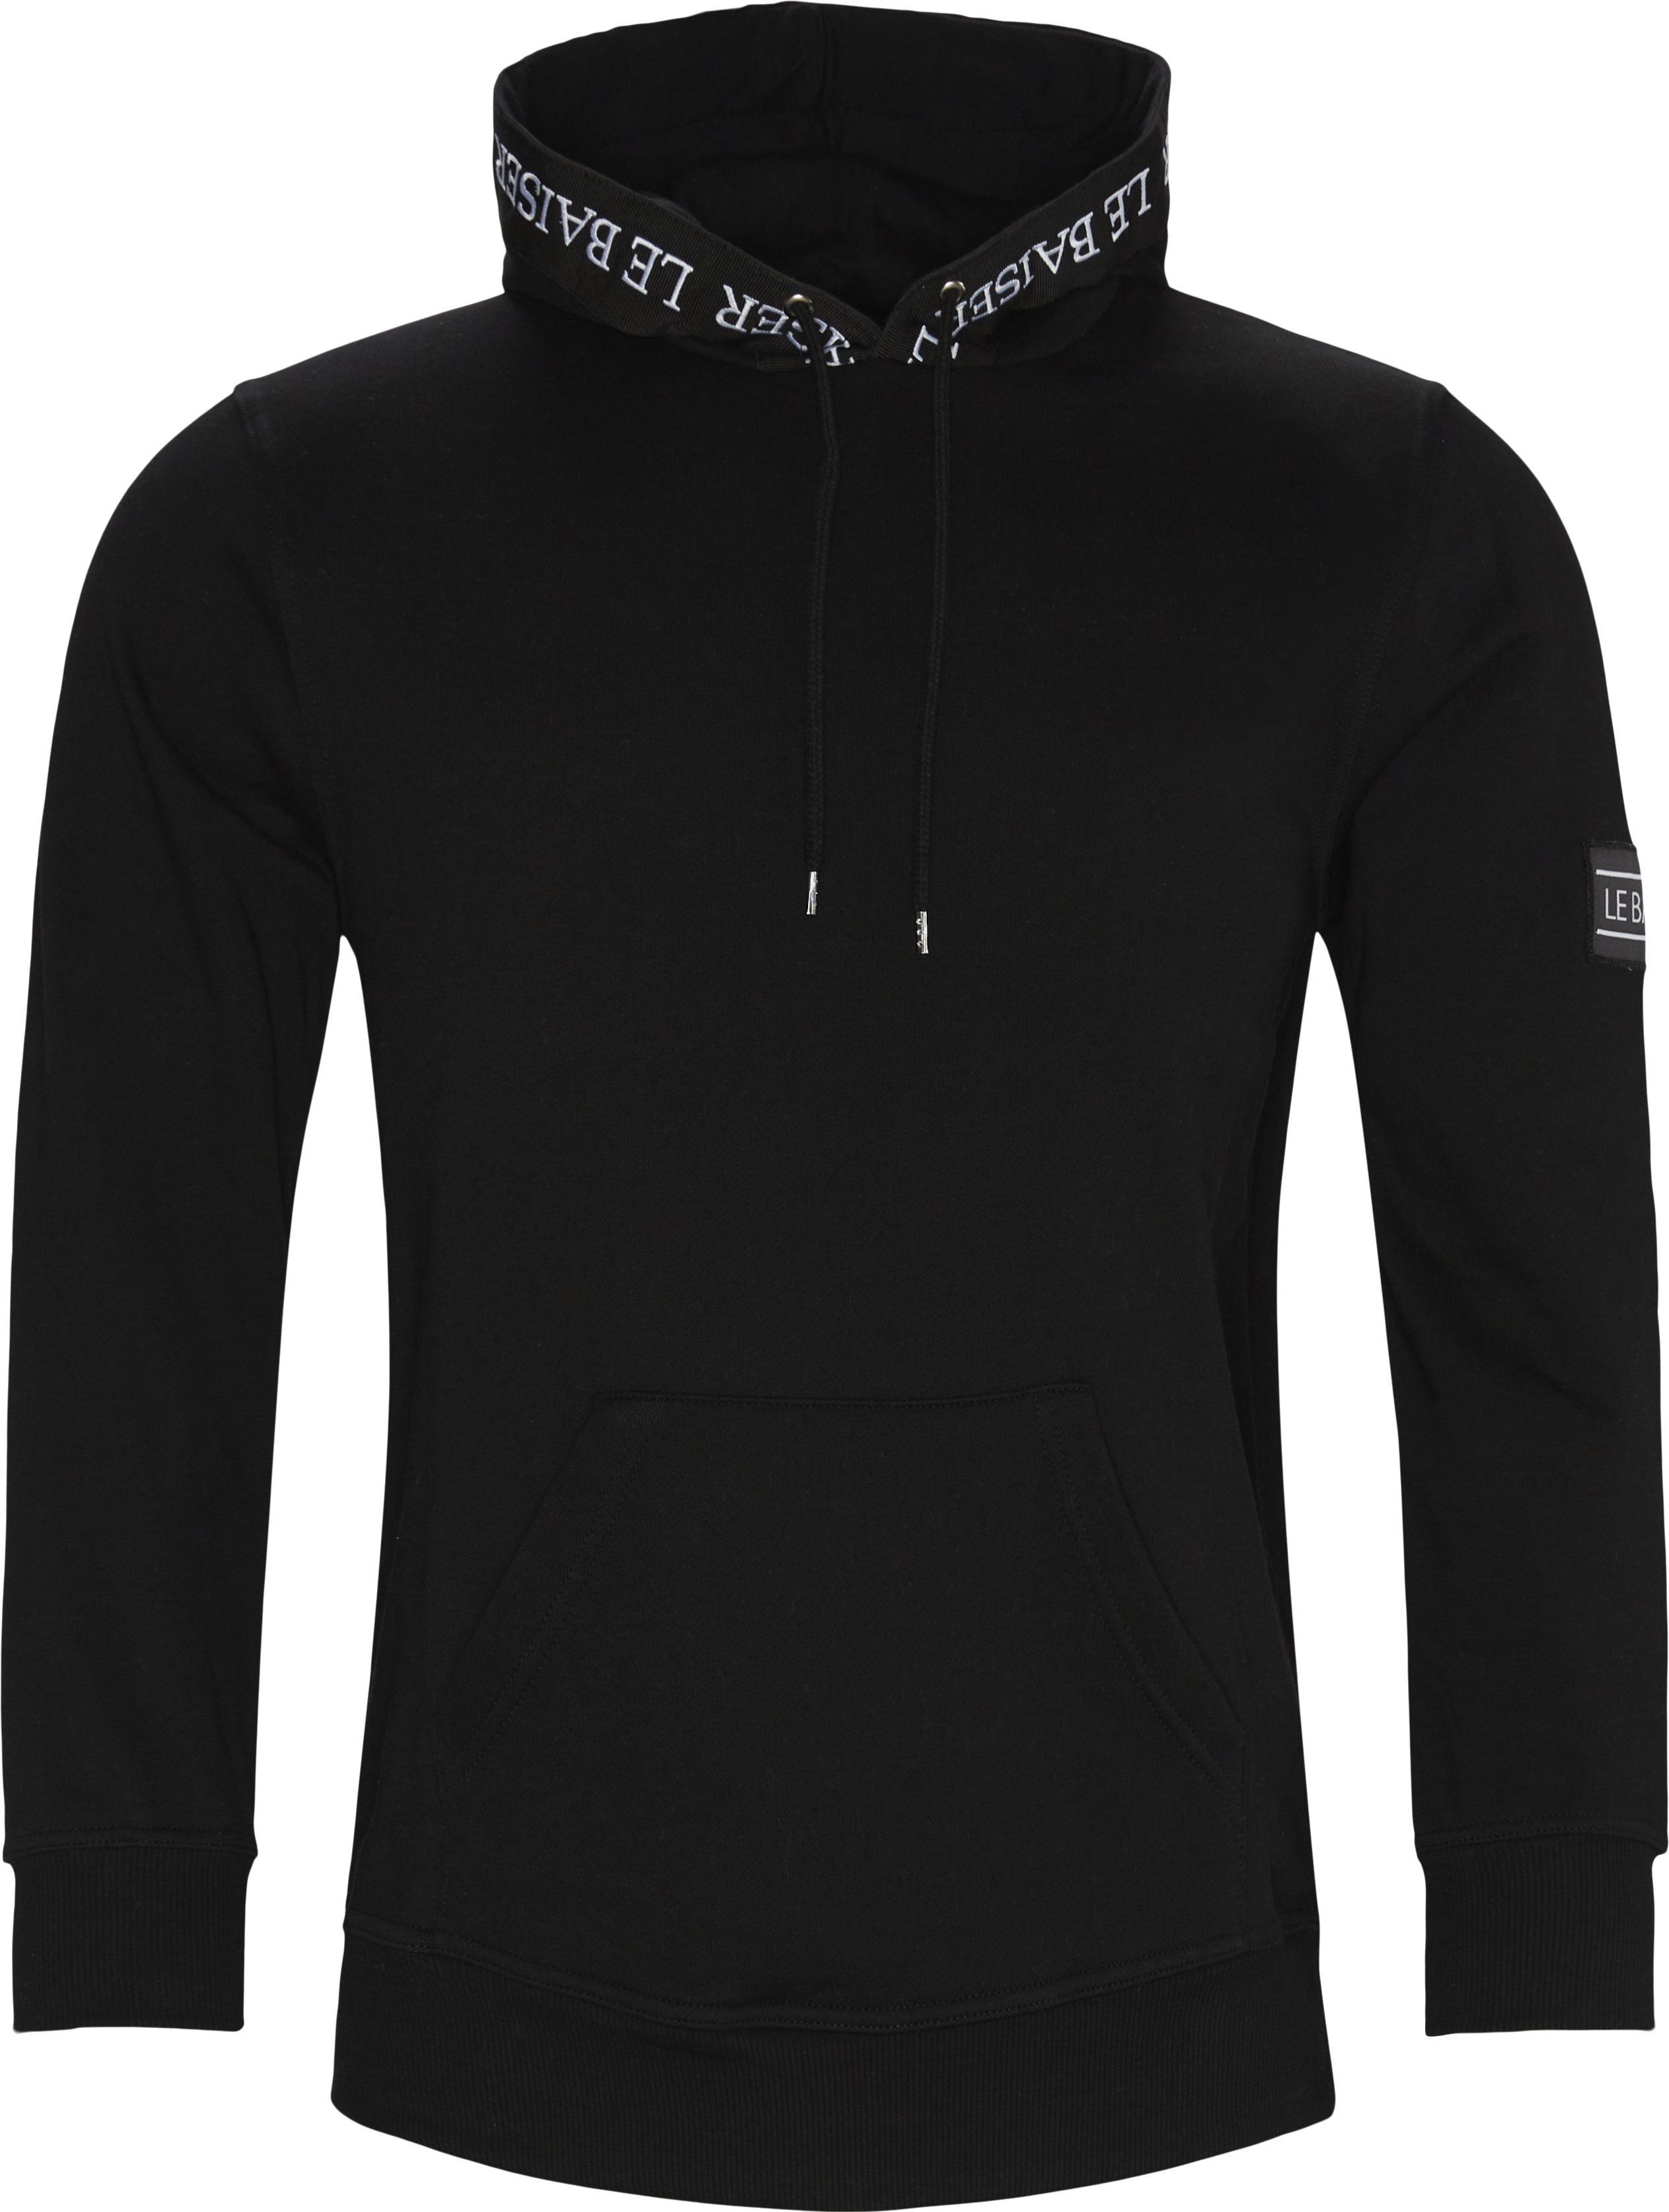 Provence Hoodie - Sweatshirts - Regular - Sort